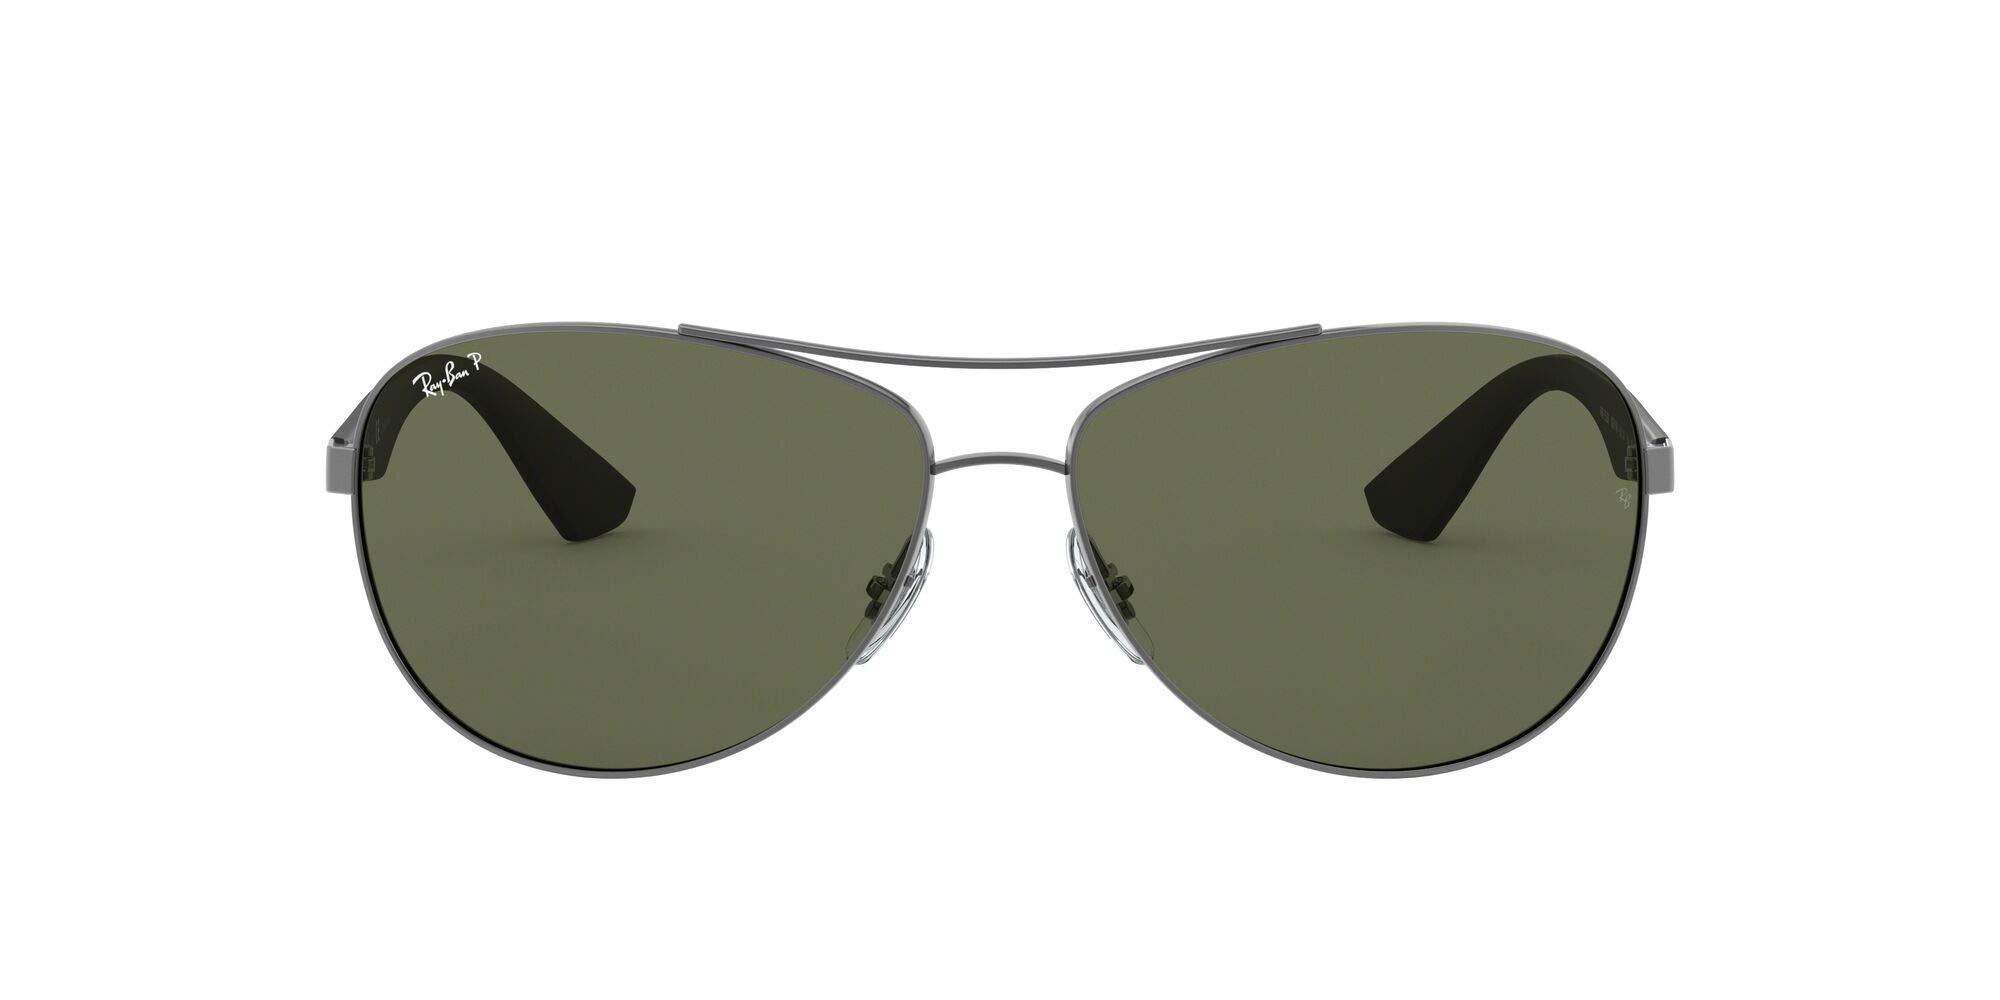 Men's Rb3526 Aviator Sunglasses